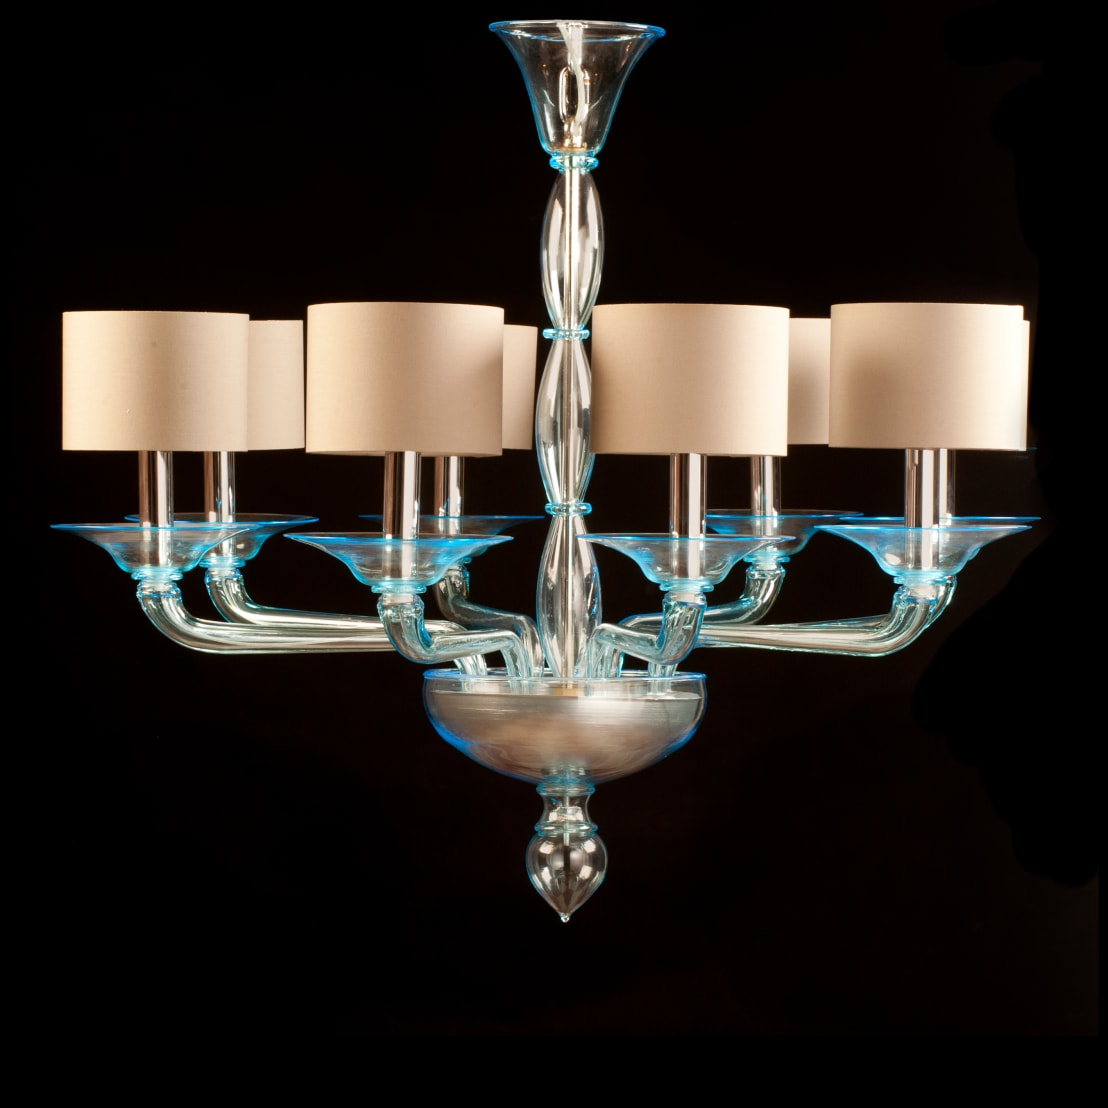 Lampadario in vetro di murano lampadario moderno in for Oscar utensili